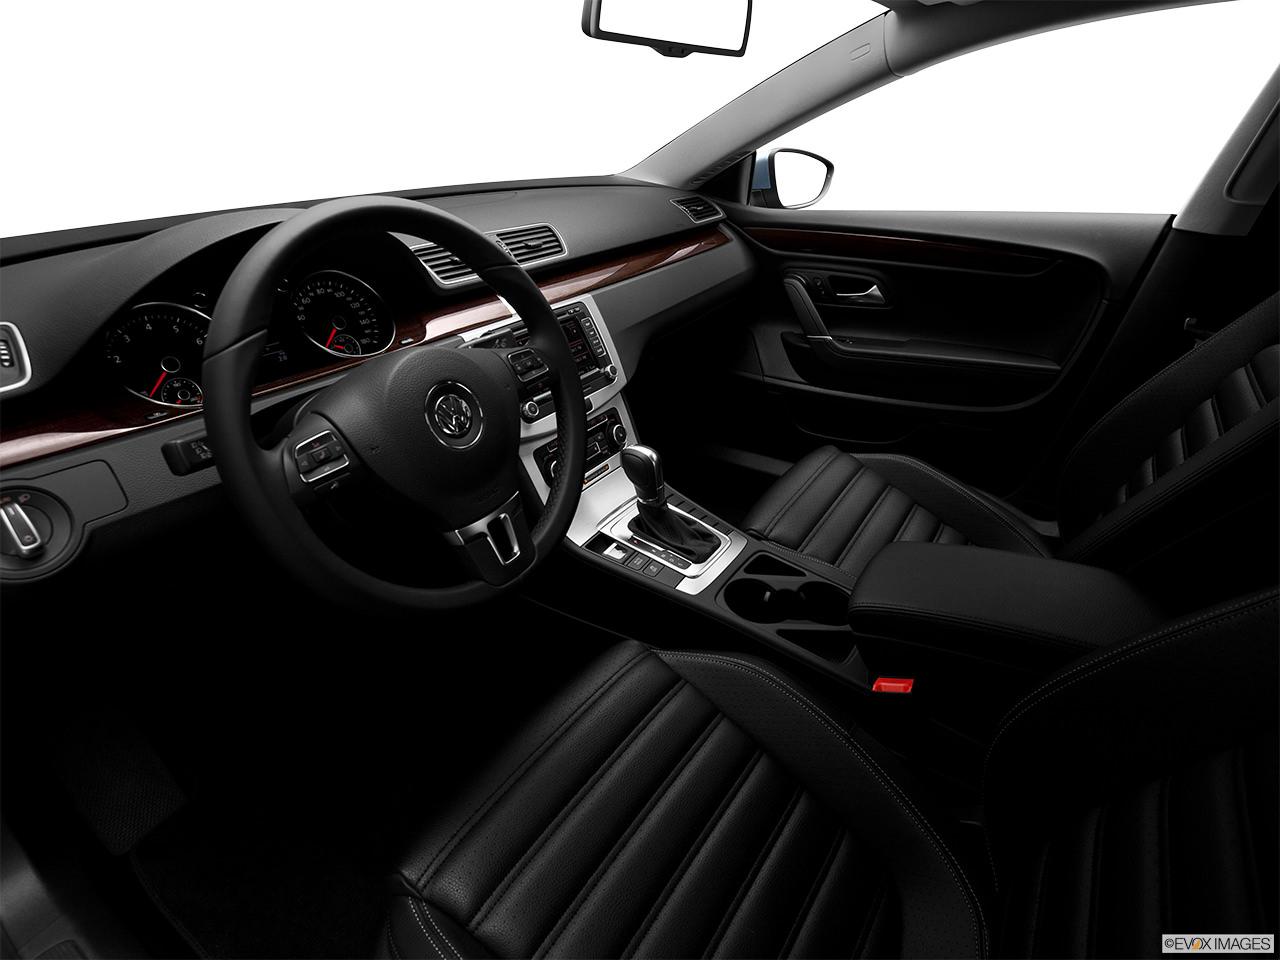 Volkswagen CC 2012 Interior